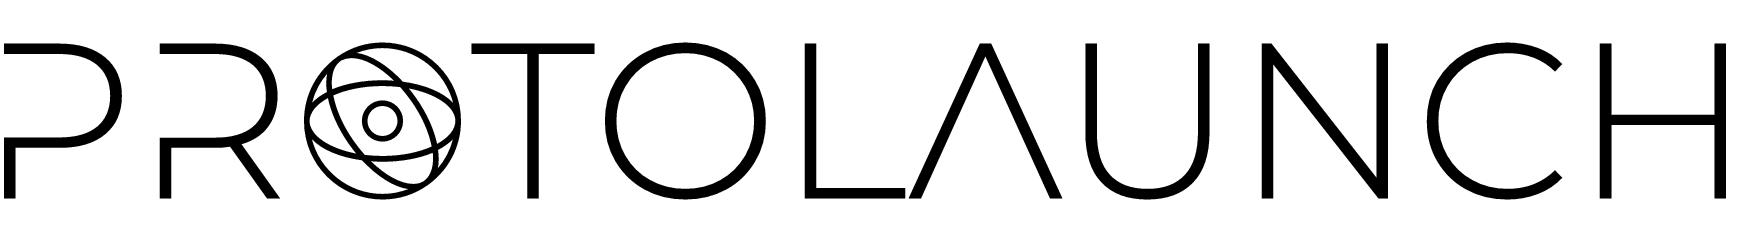 protolaunch Black logo no background